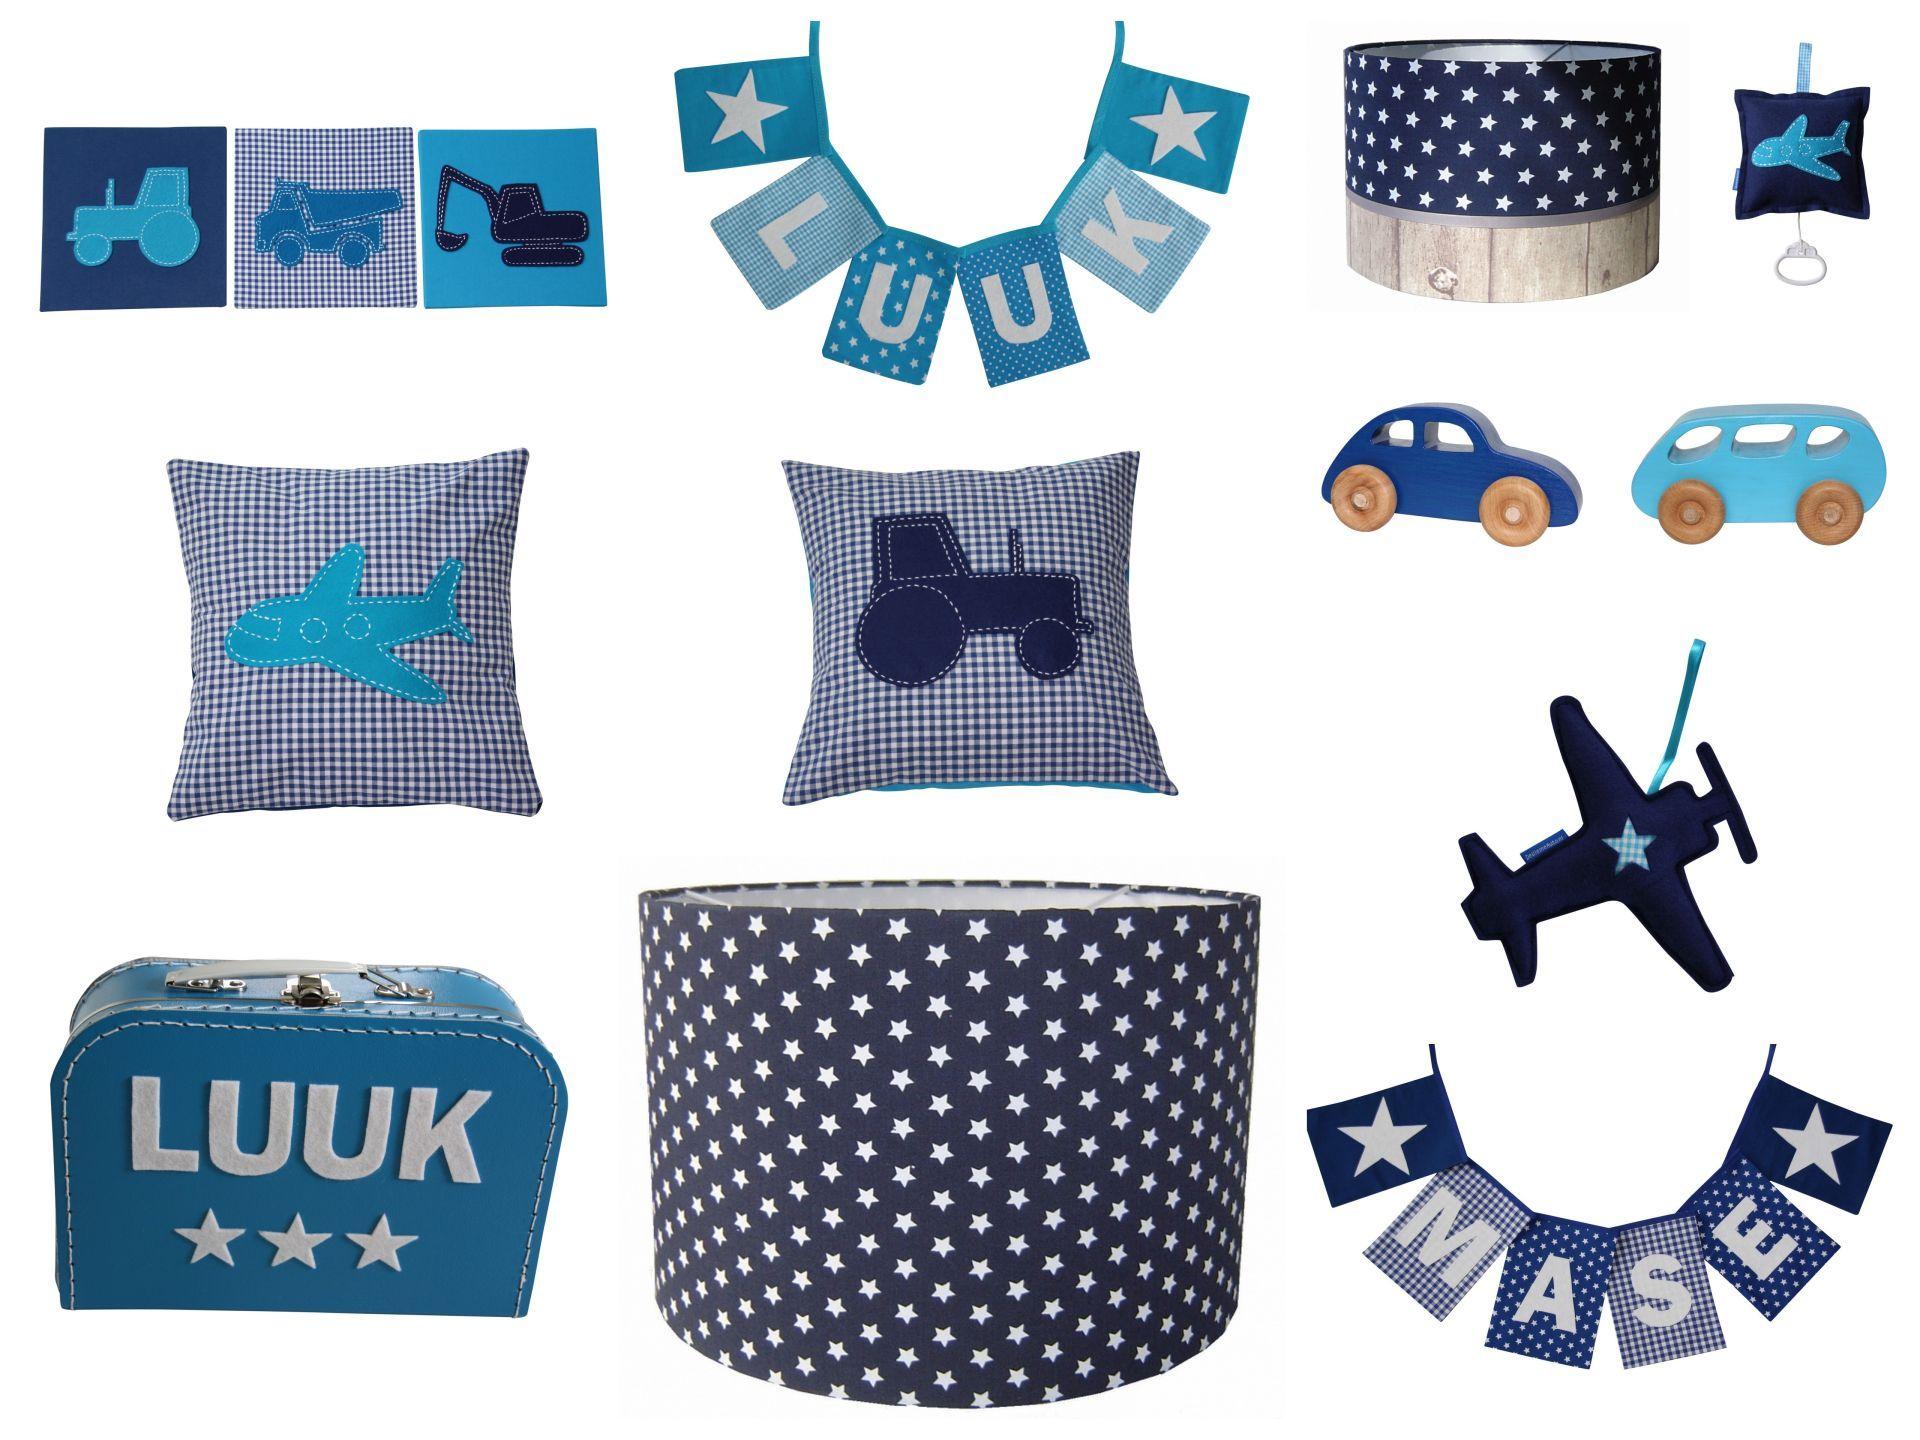 Blauwe Baby Accessoires.Accessoires Babykamer Kinderkamer Jongen Blauw Kinderkamer